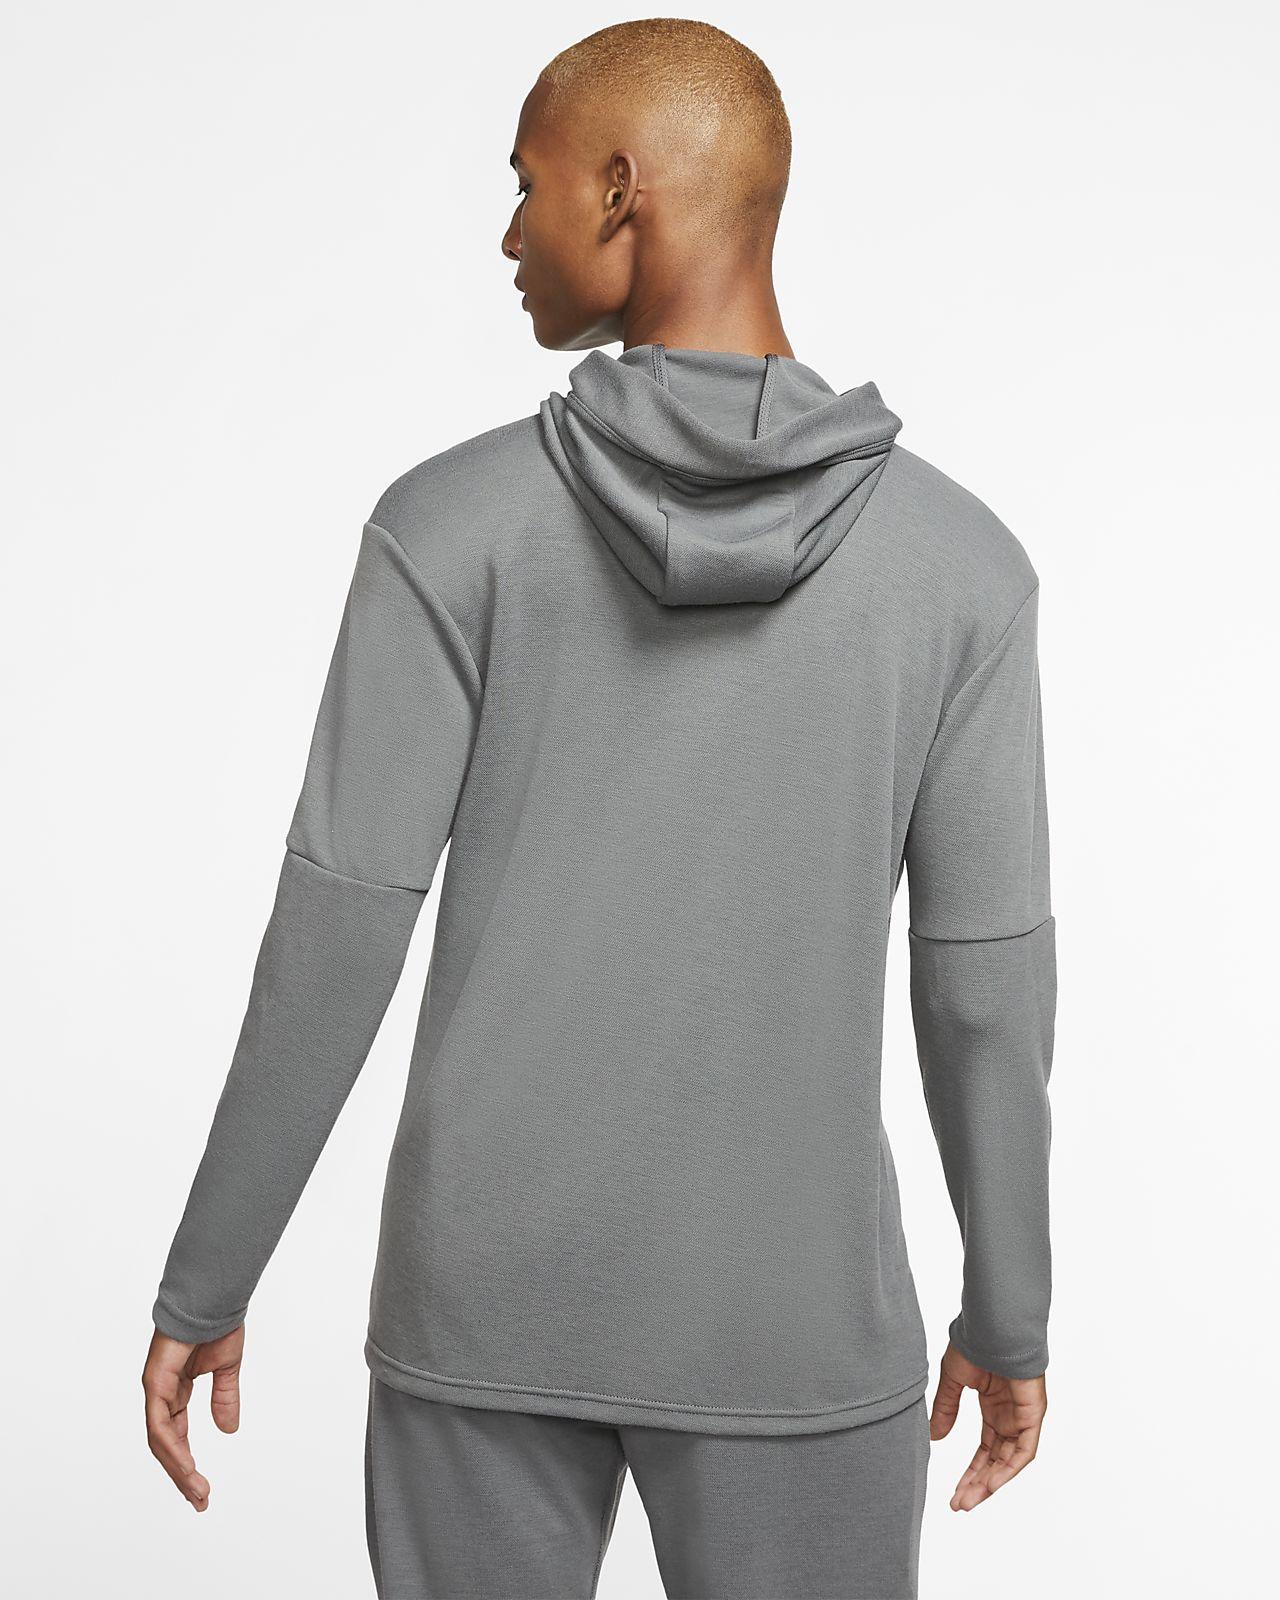 Nike Yoga Dri FIT Herren Hoodie